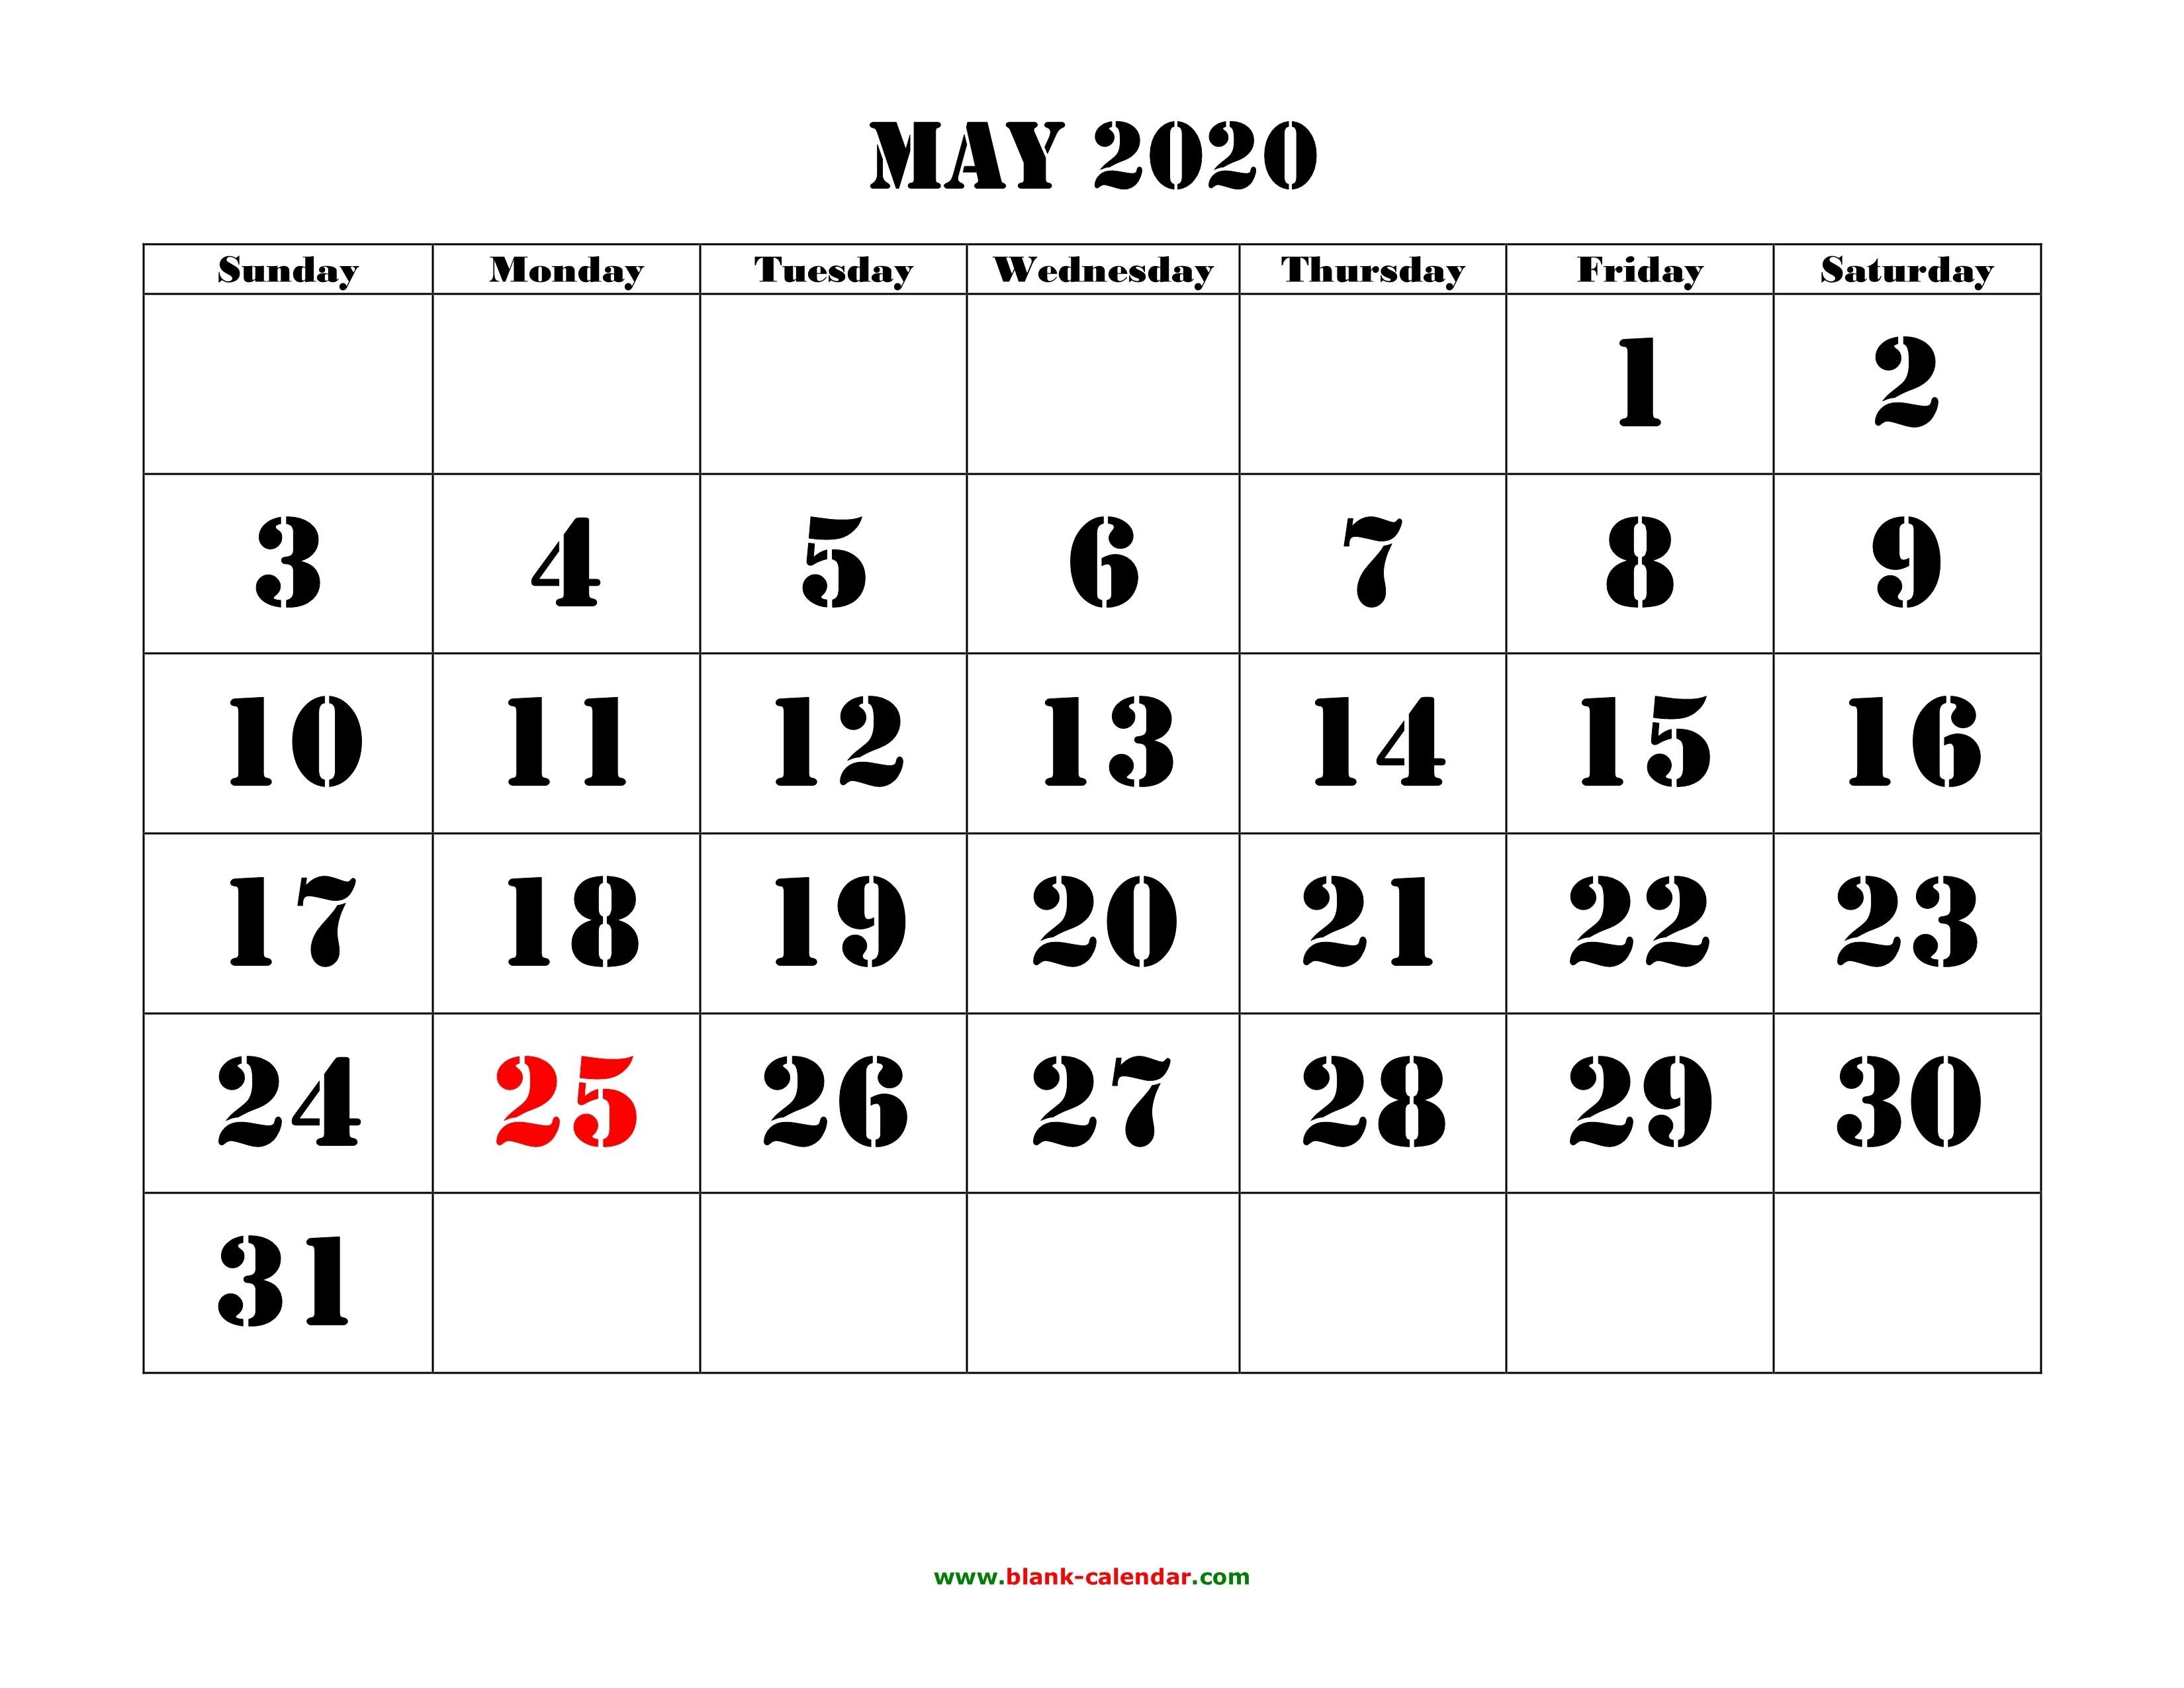 Free Printable 2020 Calendar With Holidays 8 - Crearphpnuke-Free Mickey Mouse Printable Monthly Calendar 2020